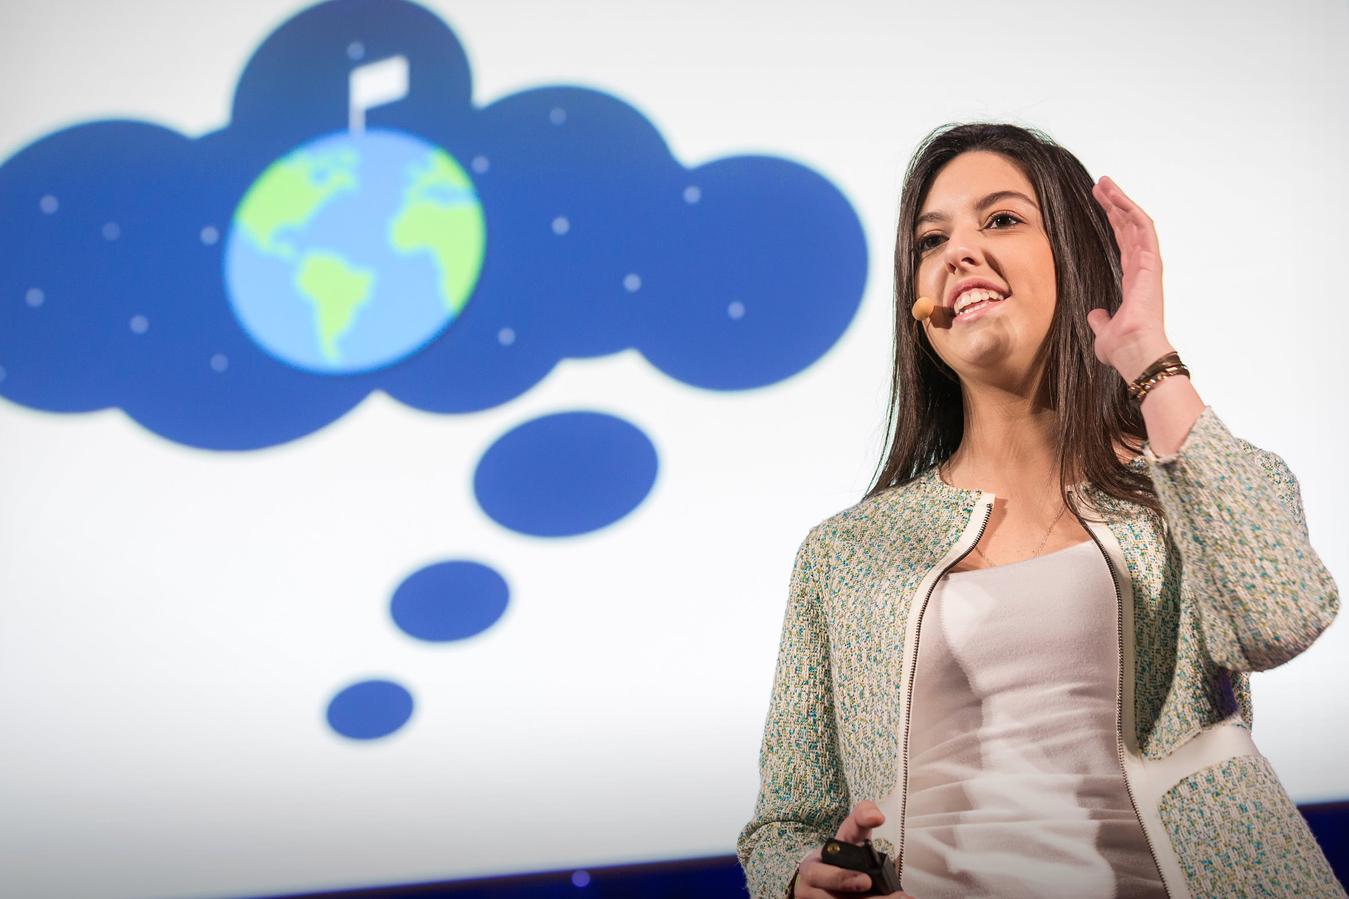 Empreendedora brasileira formada no MIT quer mudar o Brasil